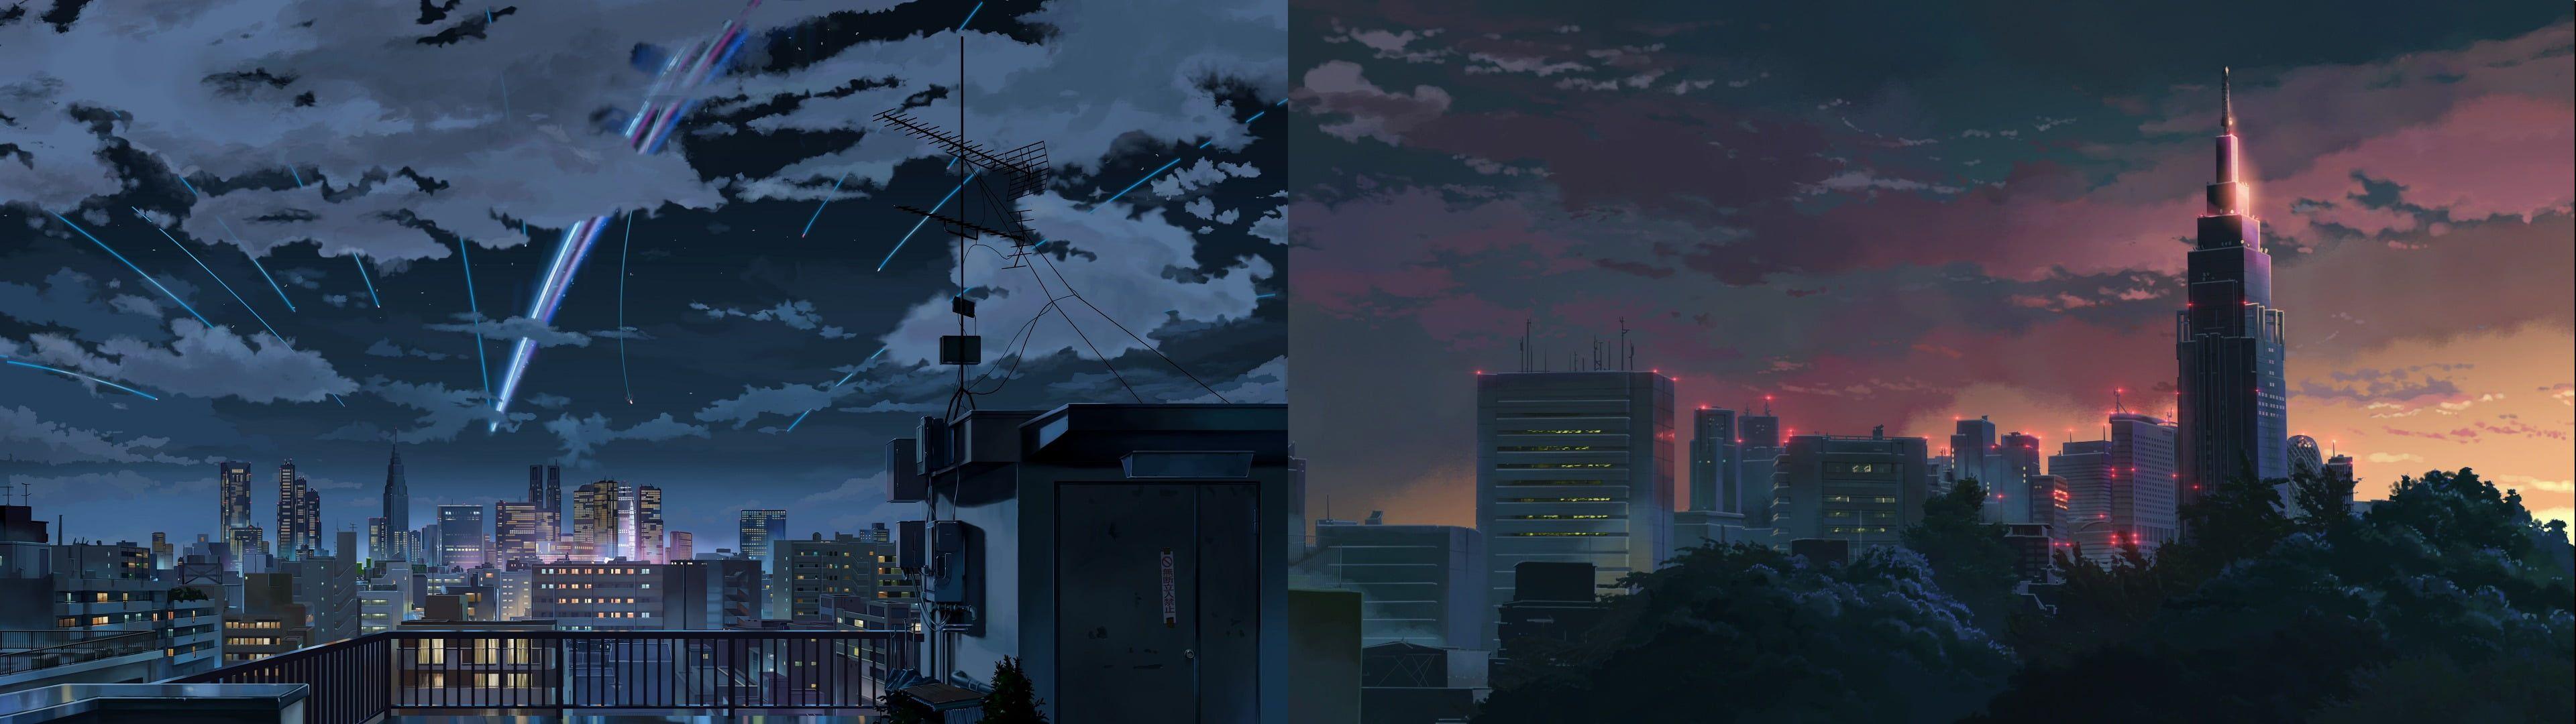 Gray Concrete Buildings Collage Kimi No Na Wa Anime Dual Monitors The Garden Of Words Makoto Shinkai Kimi No Na Wa Dual Monitor Wallpaper Concrete Buildings